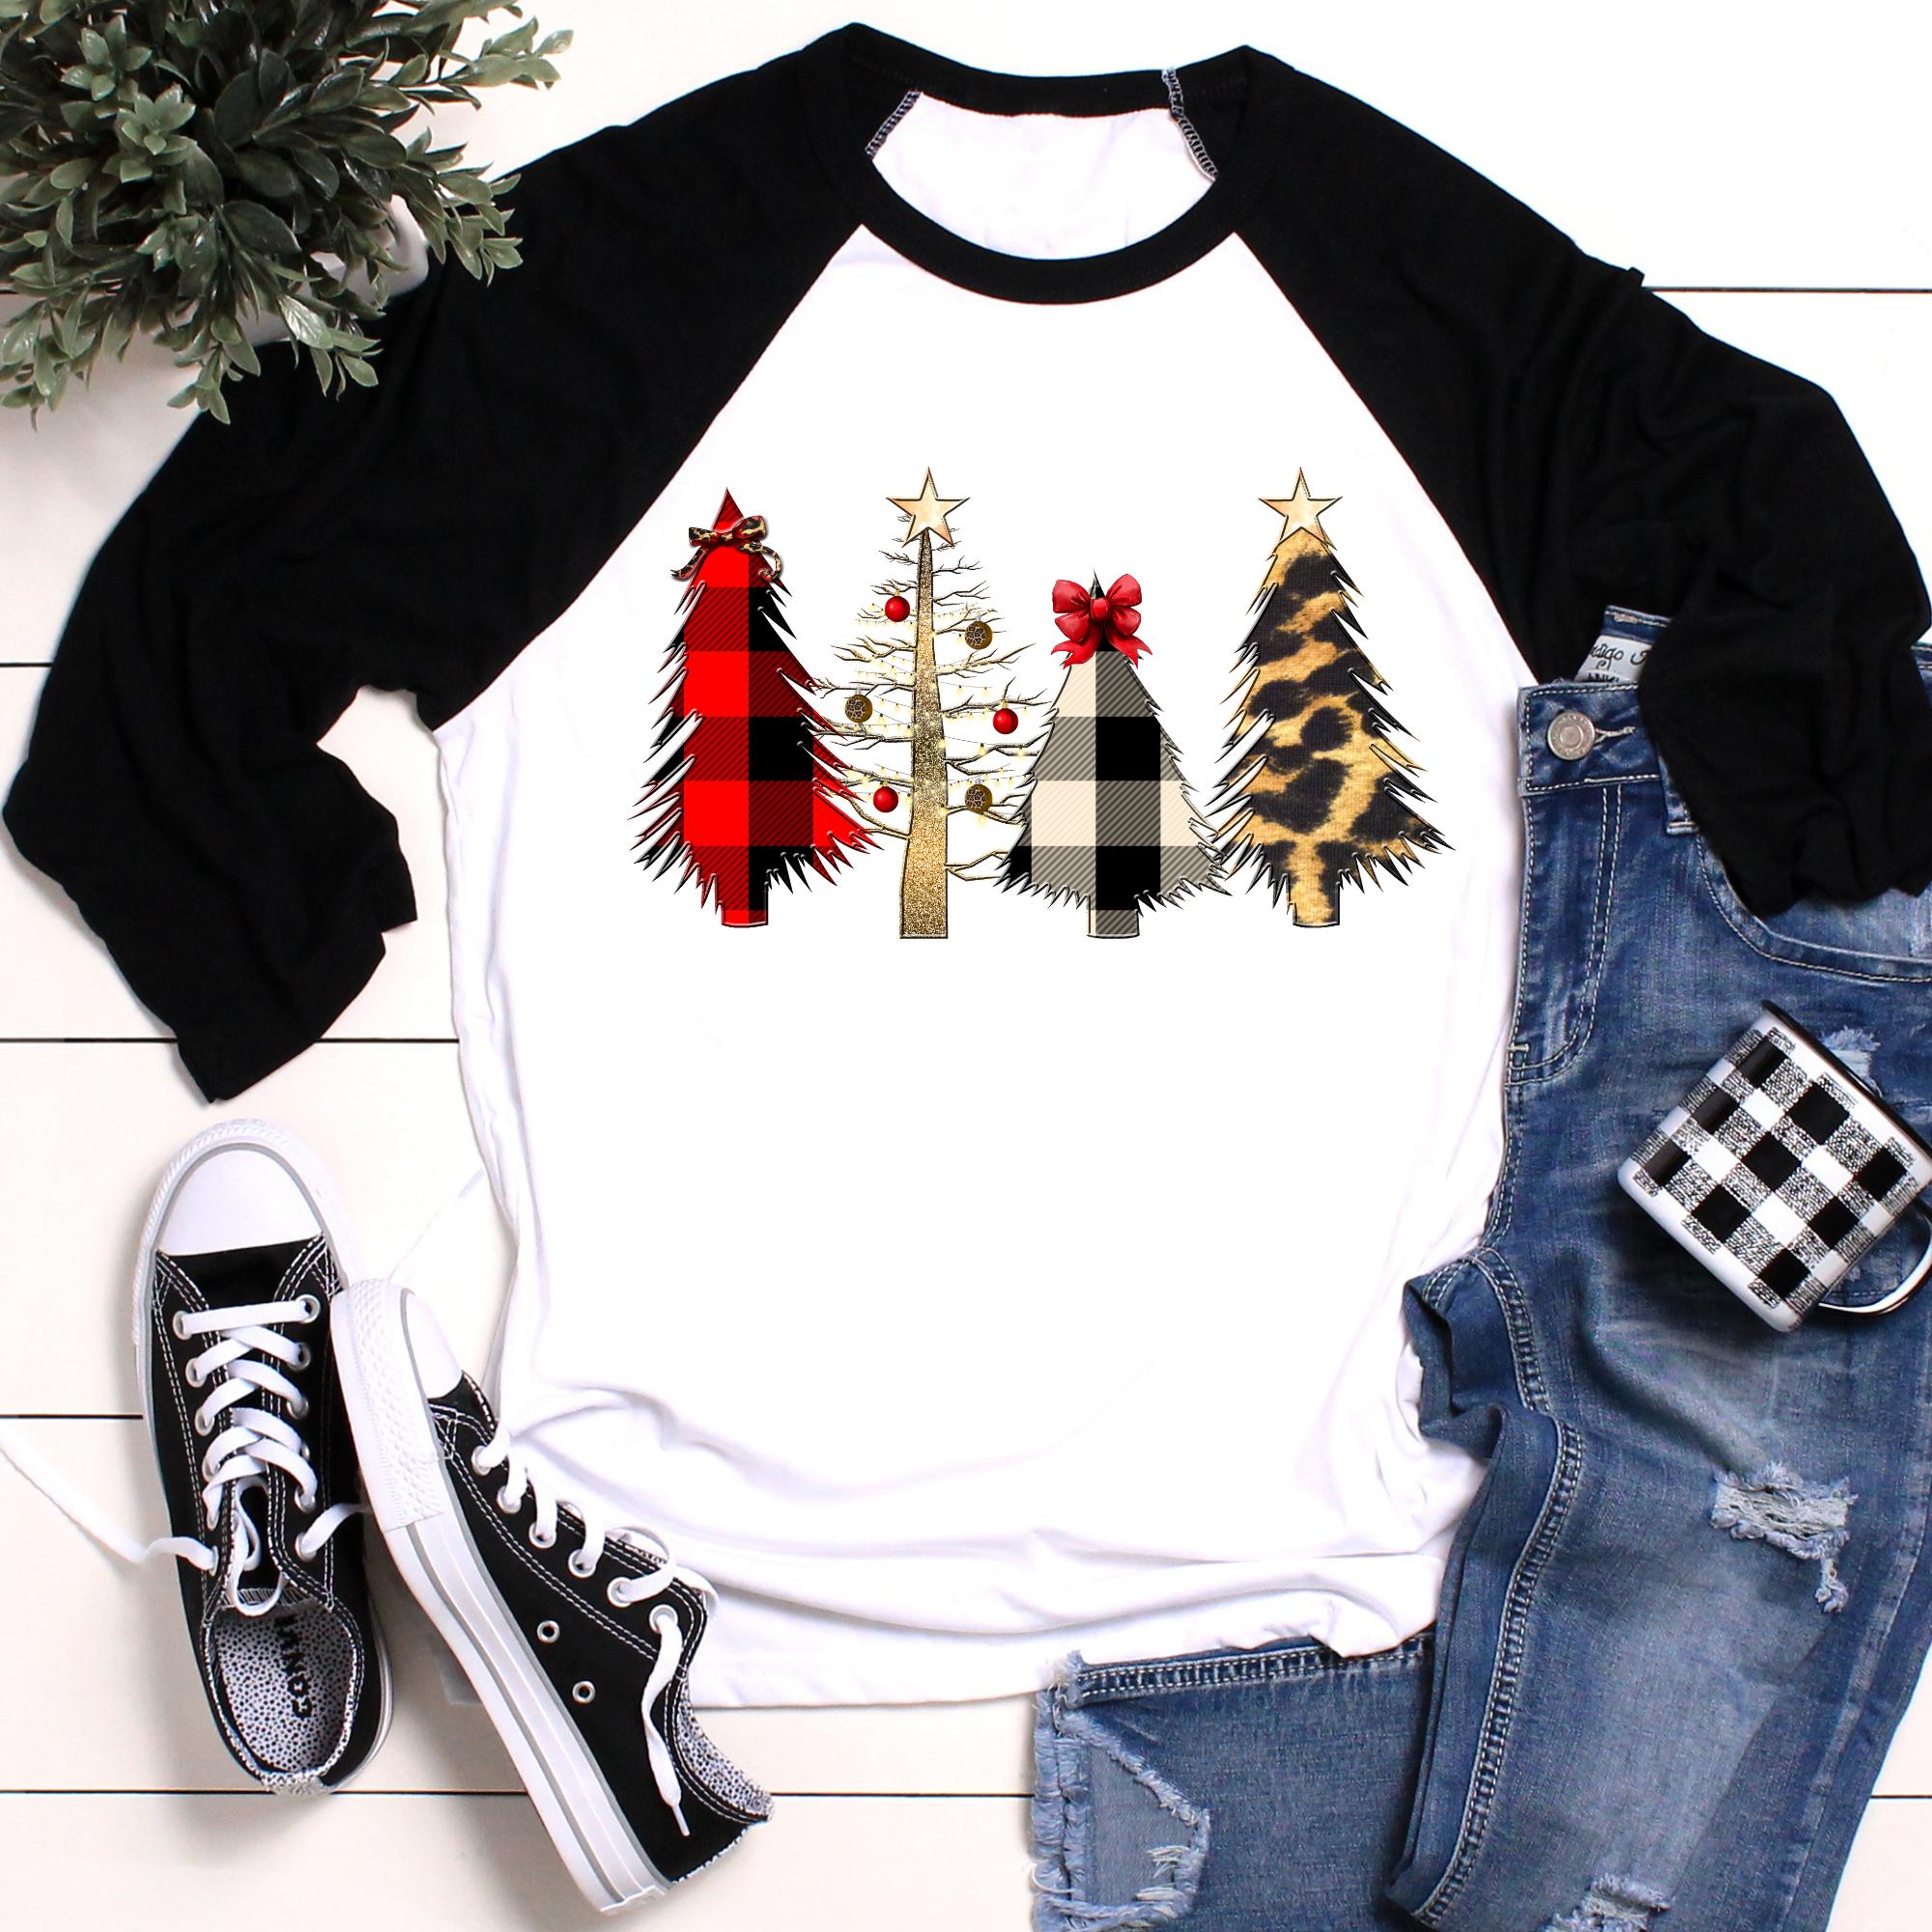 Merry Christmas Trees Shirt